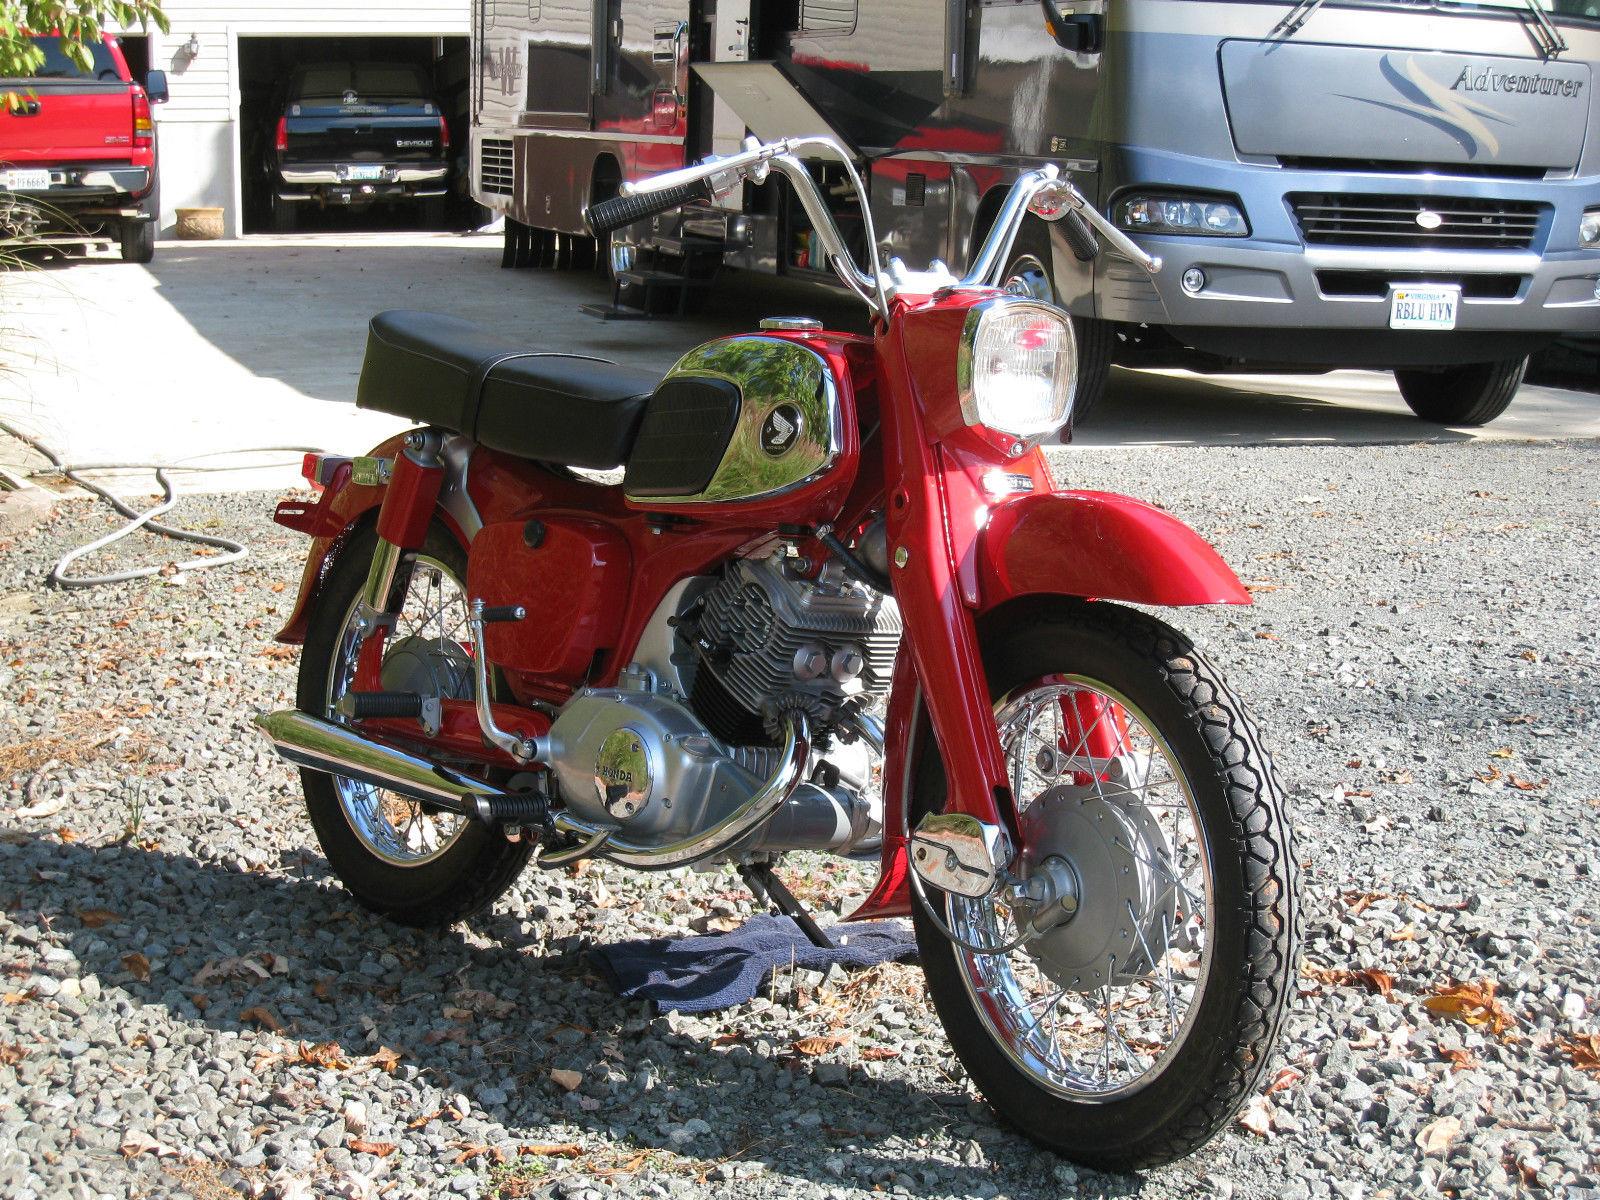 restored honda ca95 1965 photographs at classic bikes restored rh bikesrestored com 1965 Honda Cub 50 1965 Honda Cub 55 Trail